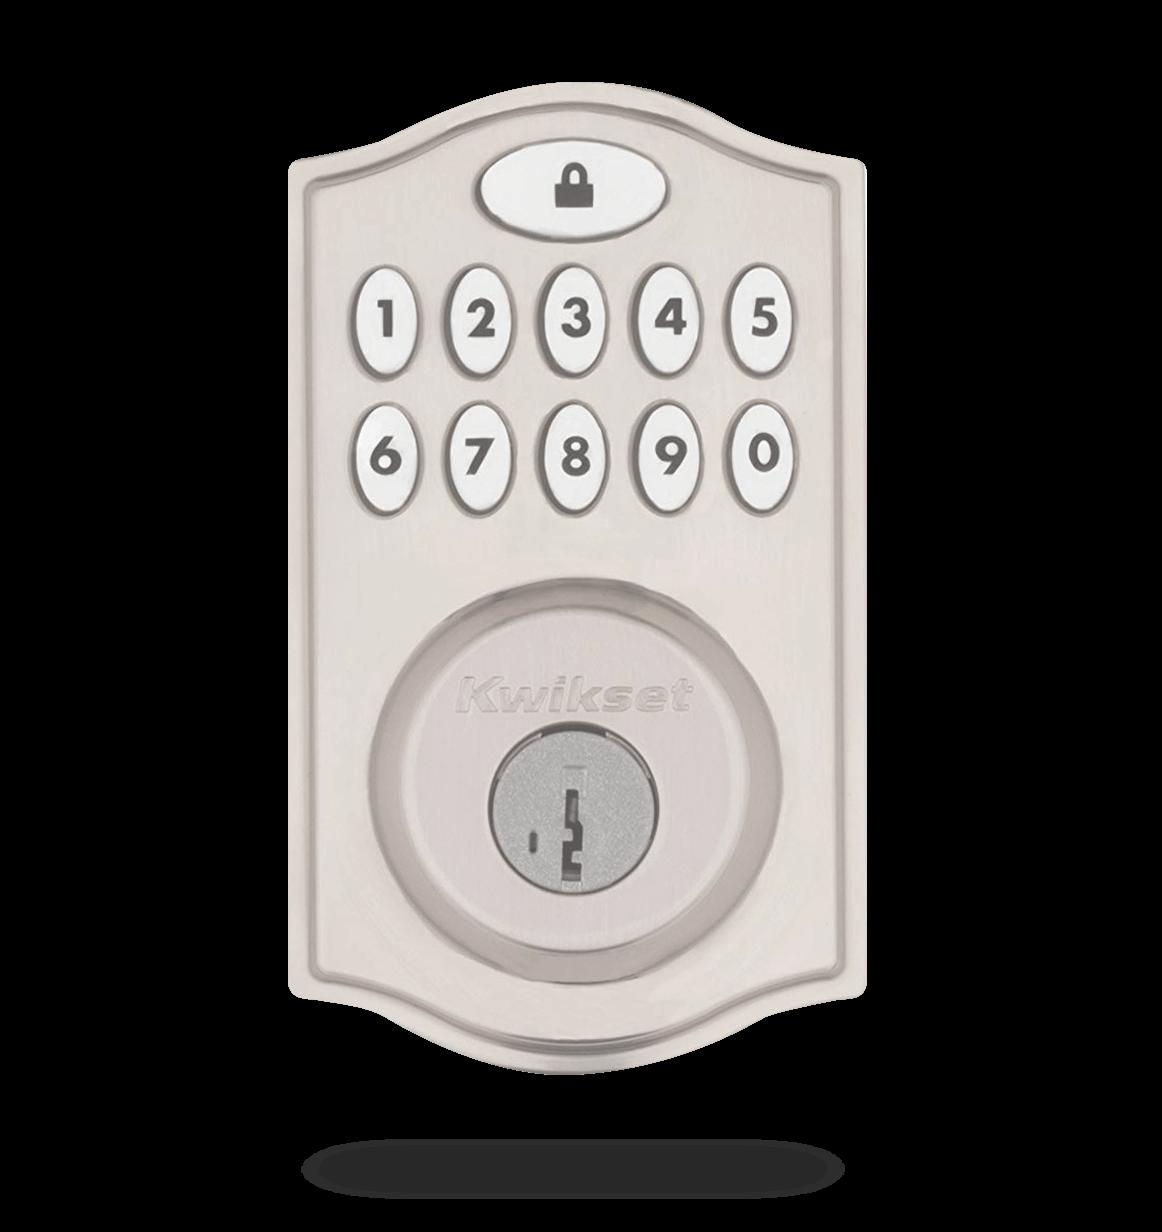 Smart Locks Smart Home Security Keyless Entry By Adt In 2020 Smart Home Security Smart Lock Home Security